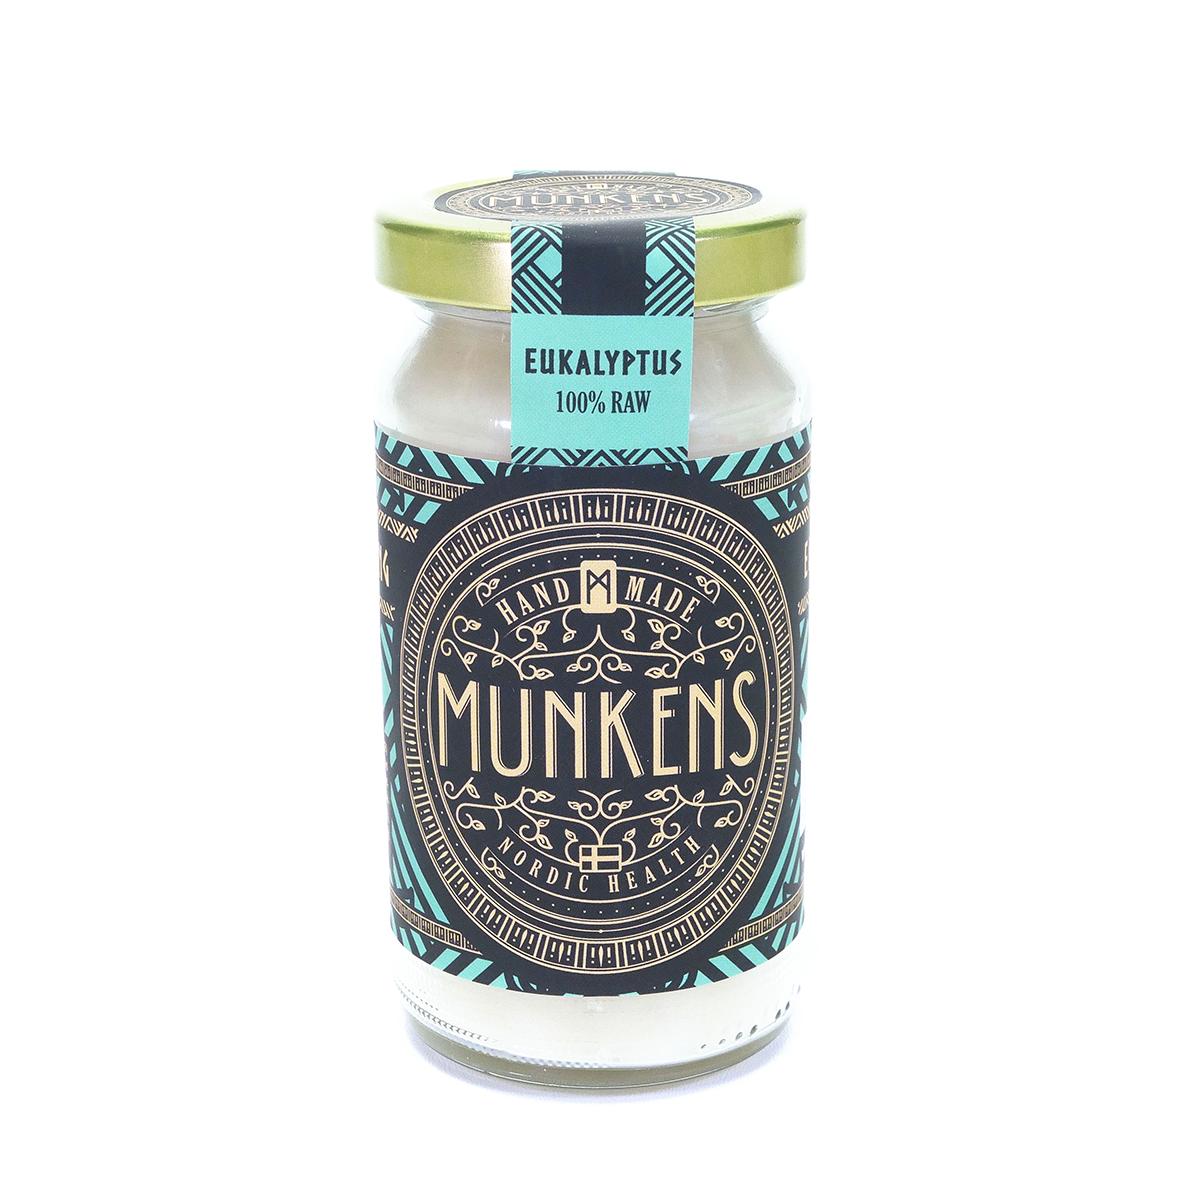 Munken_Svensk_Honung_Eukalyptus_280g